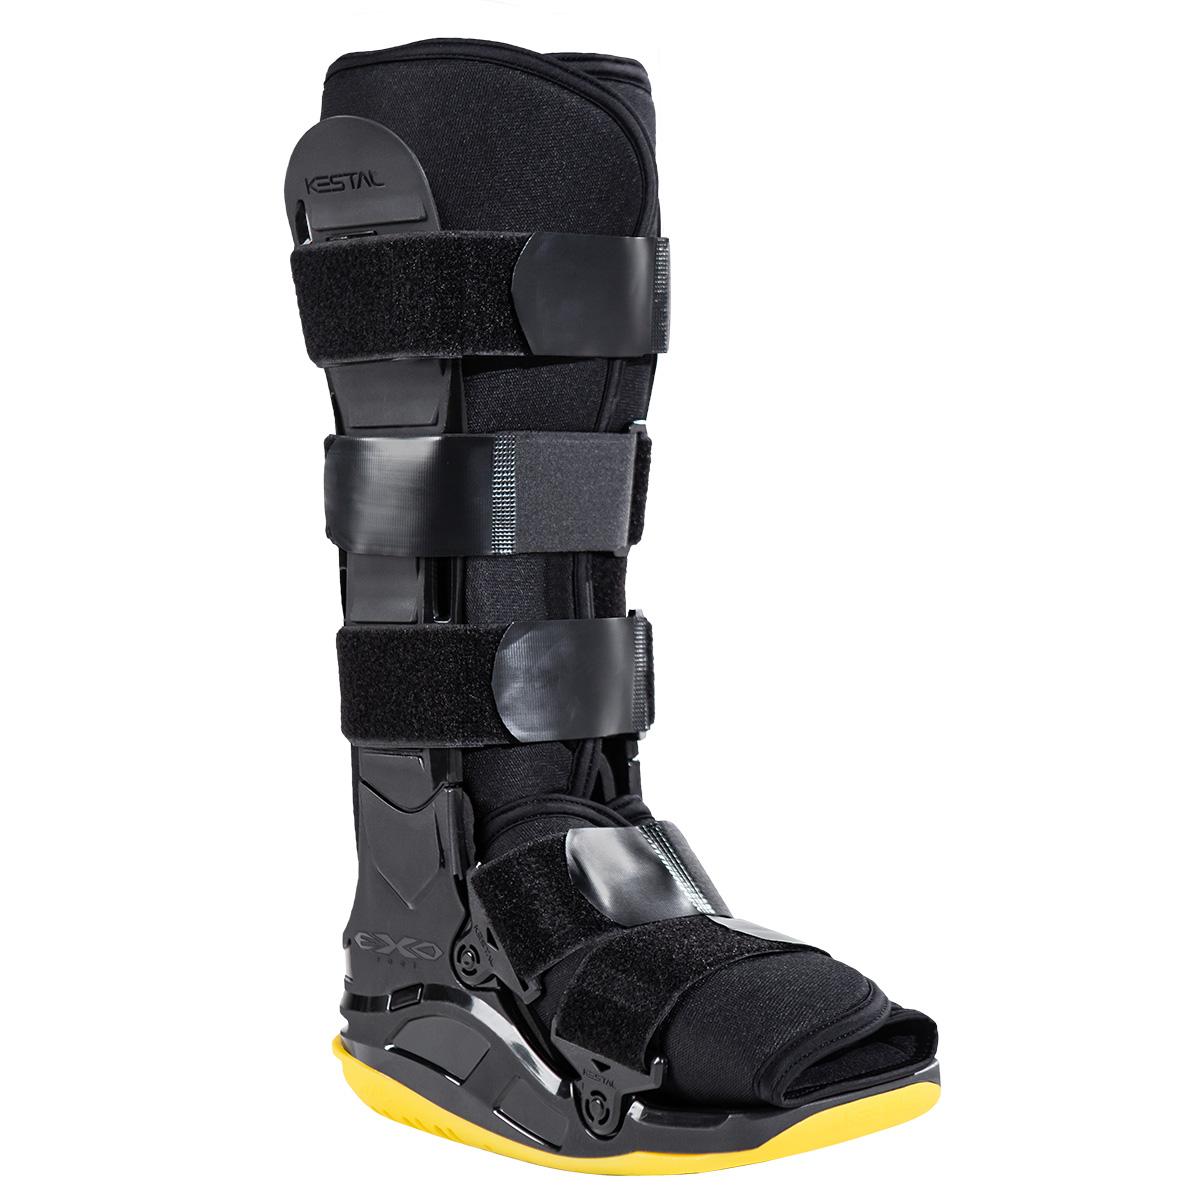 Bota Imobilizadora Exo Foot Longa Kestal